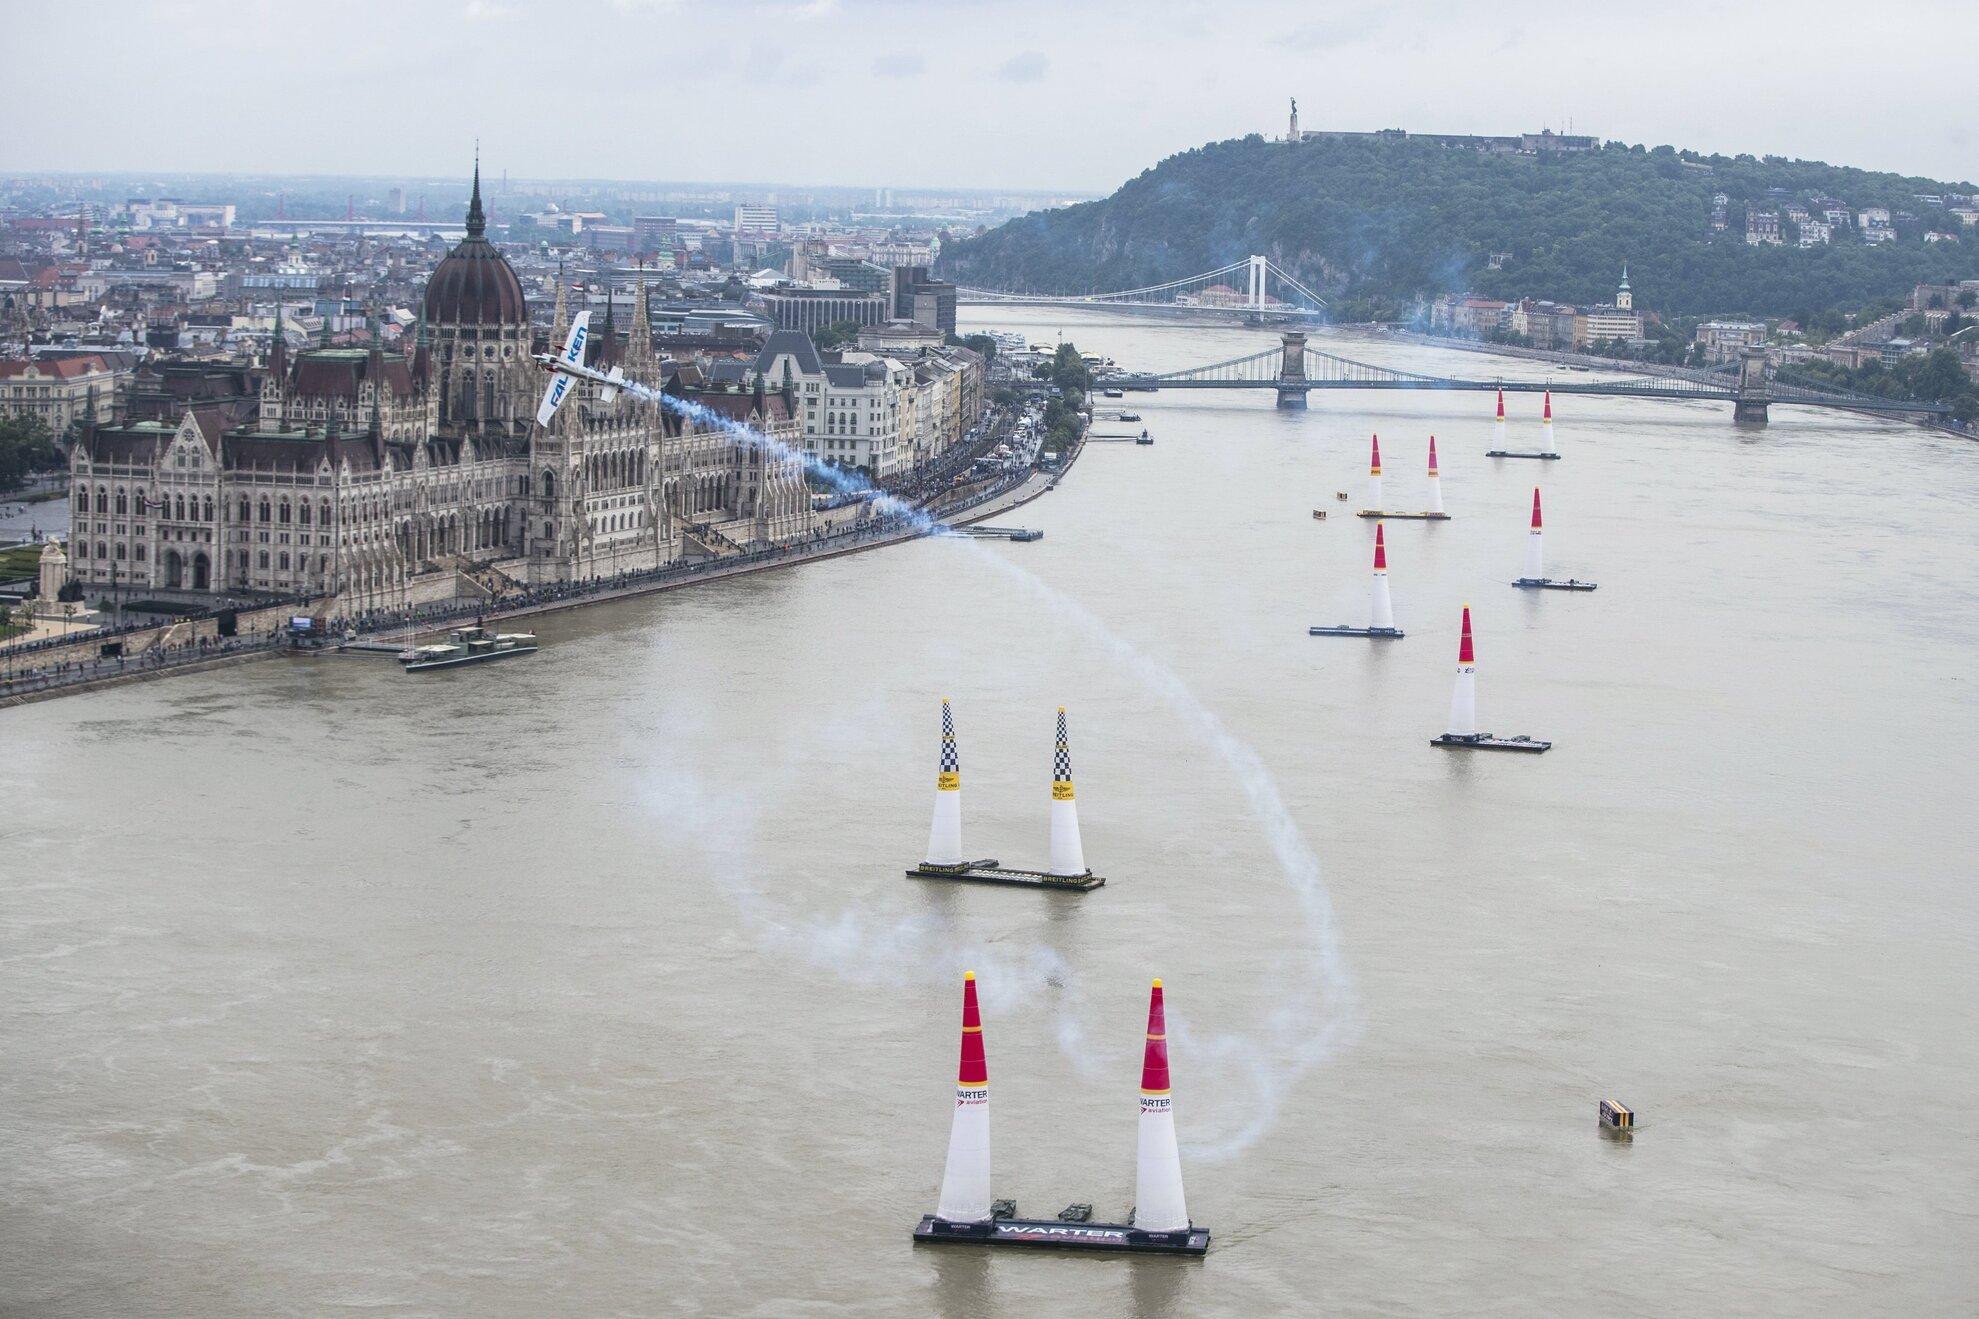 2017 calendar of Budapest festivals and events